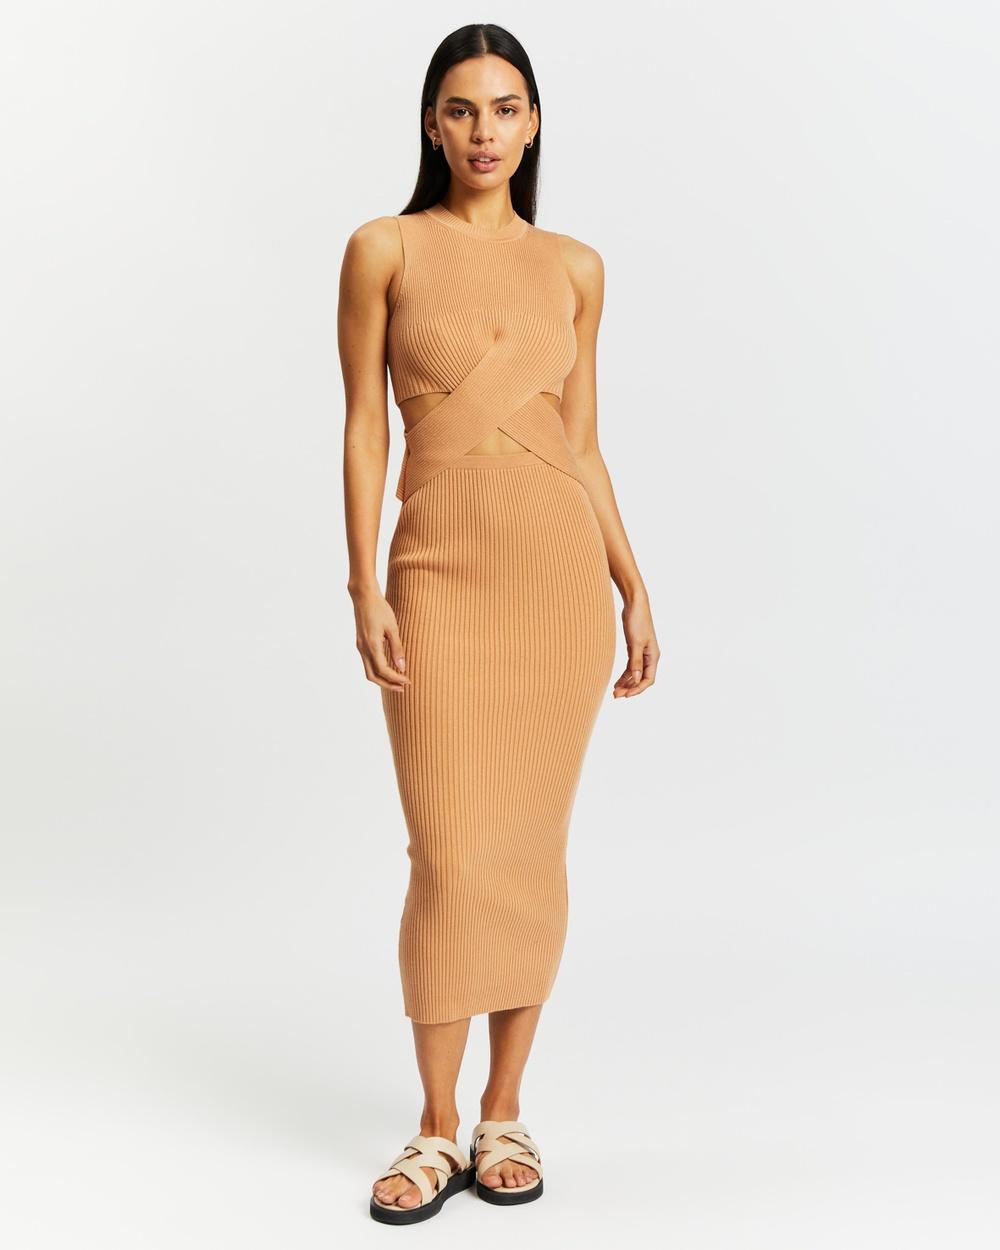 AERE Twist Waist Knit Dress Bodycon Dresses Caramel